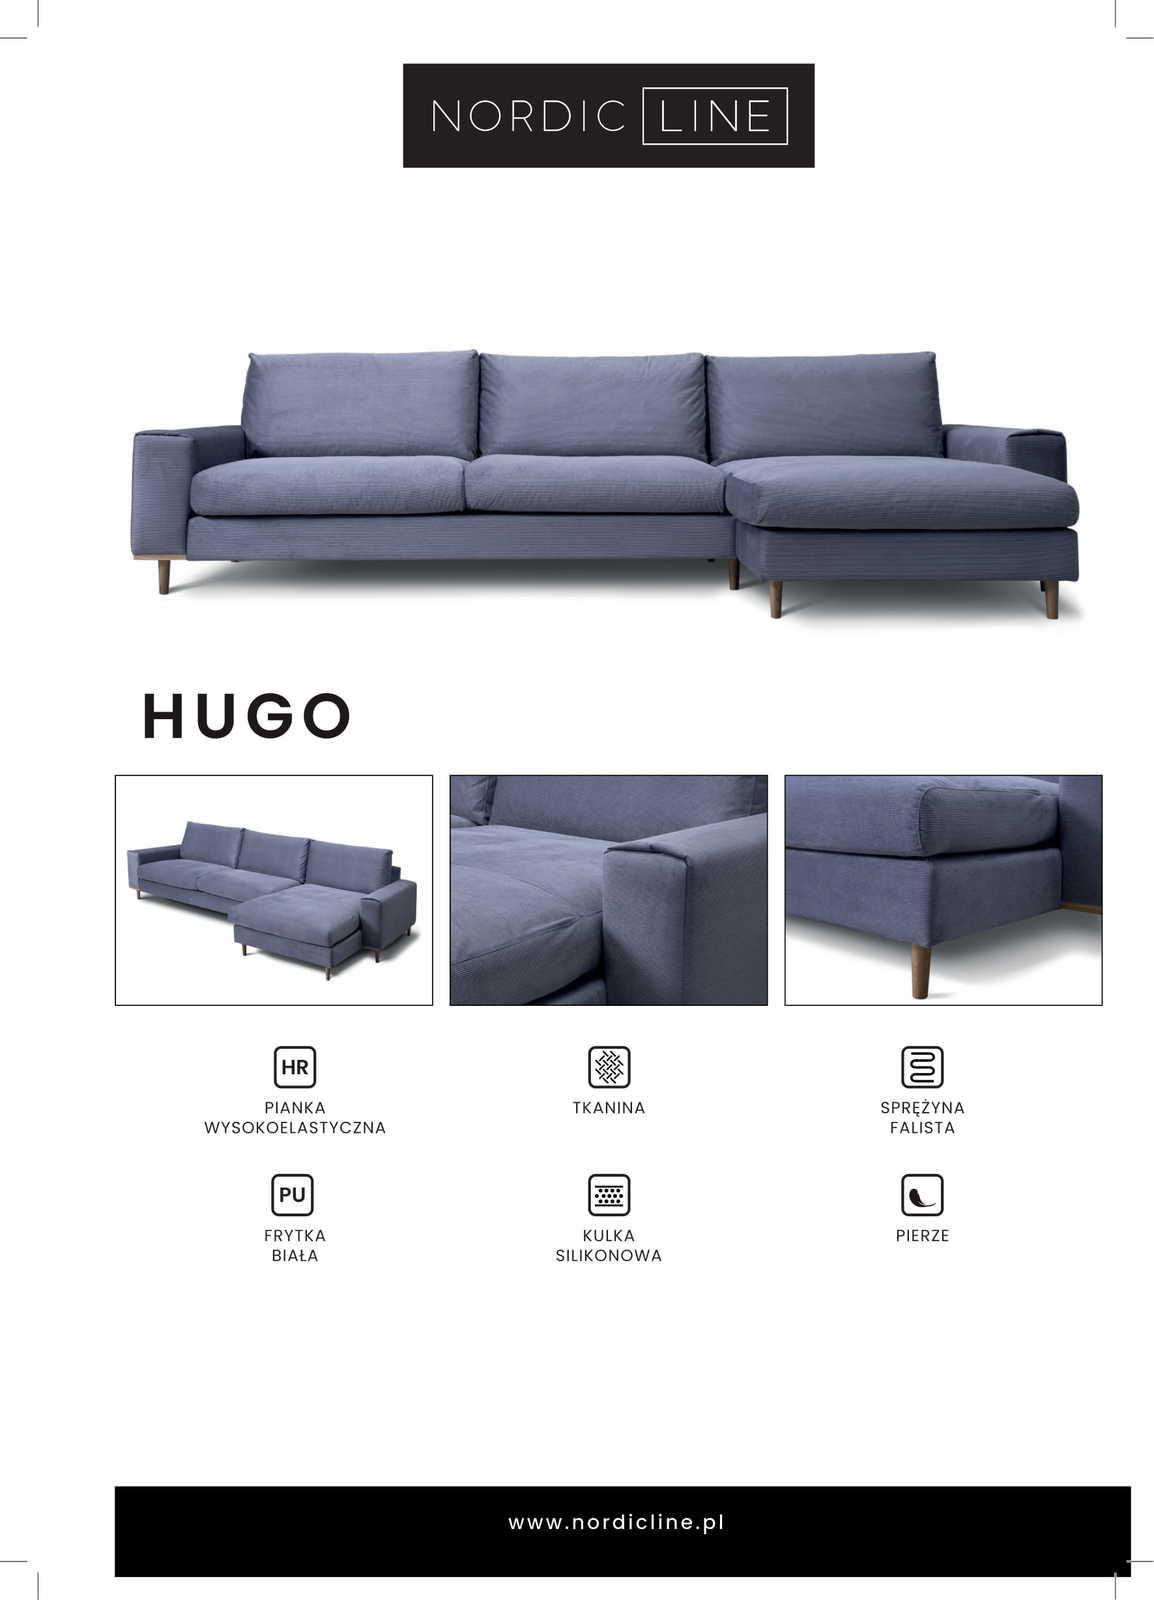 Hugo(krzywe) (4) 1